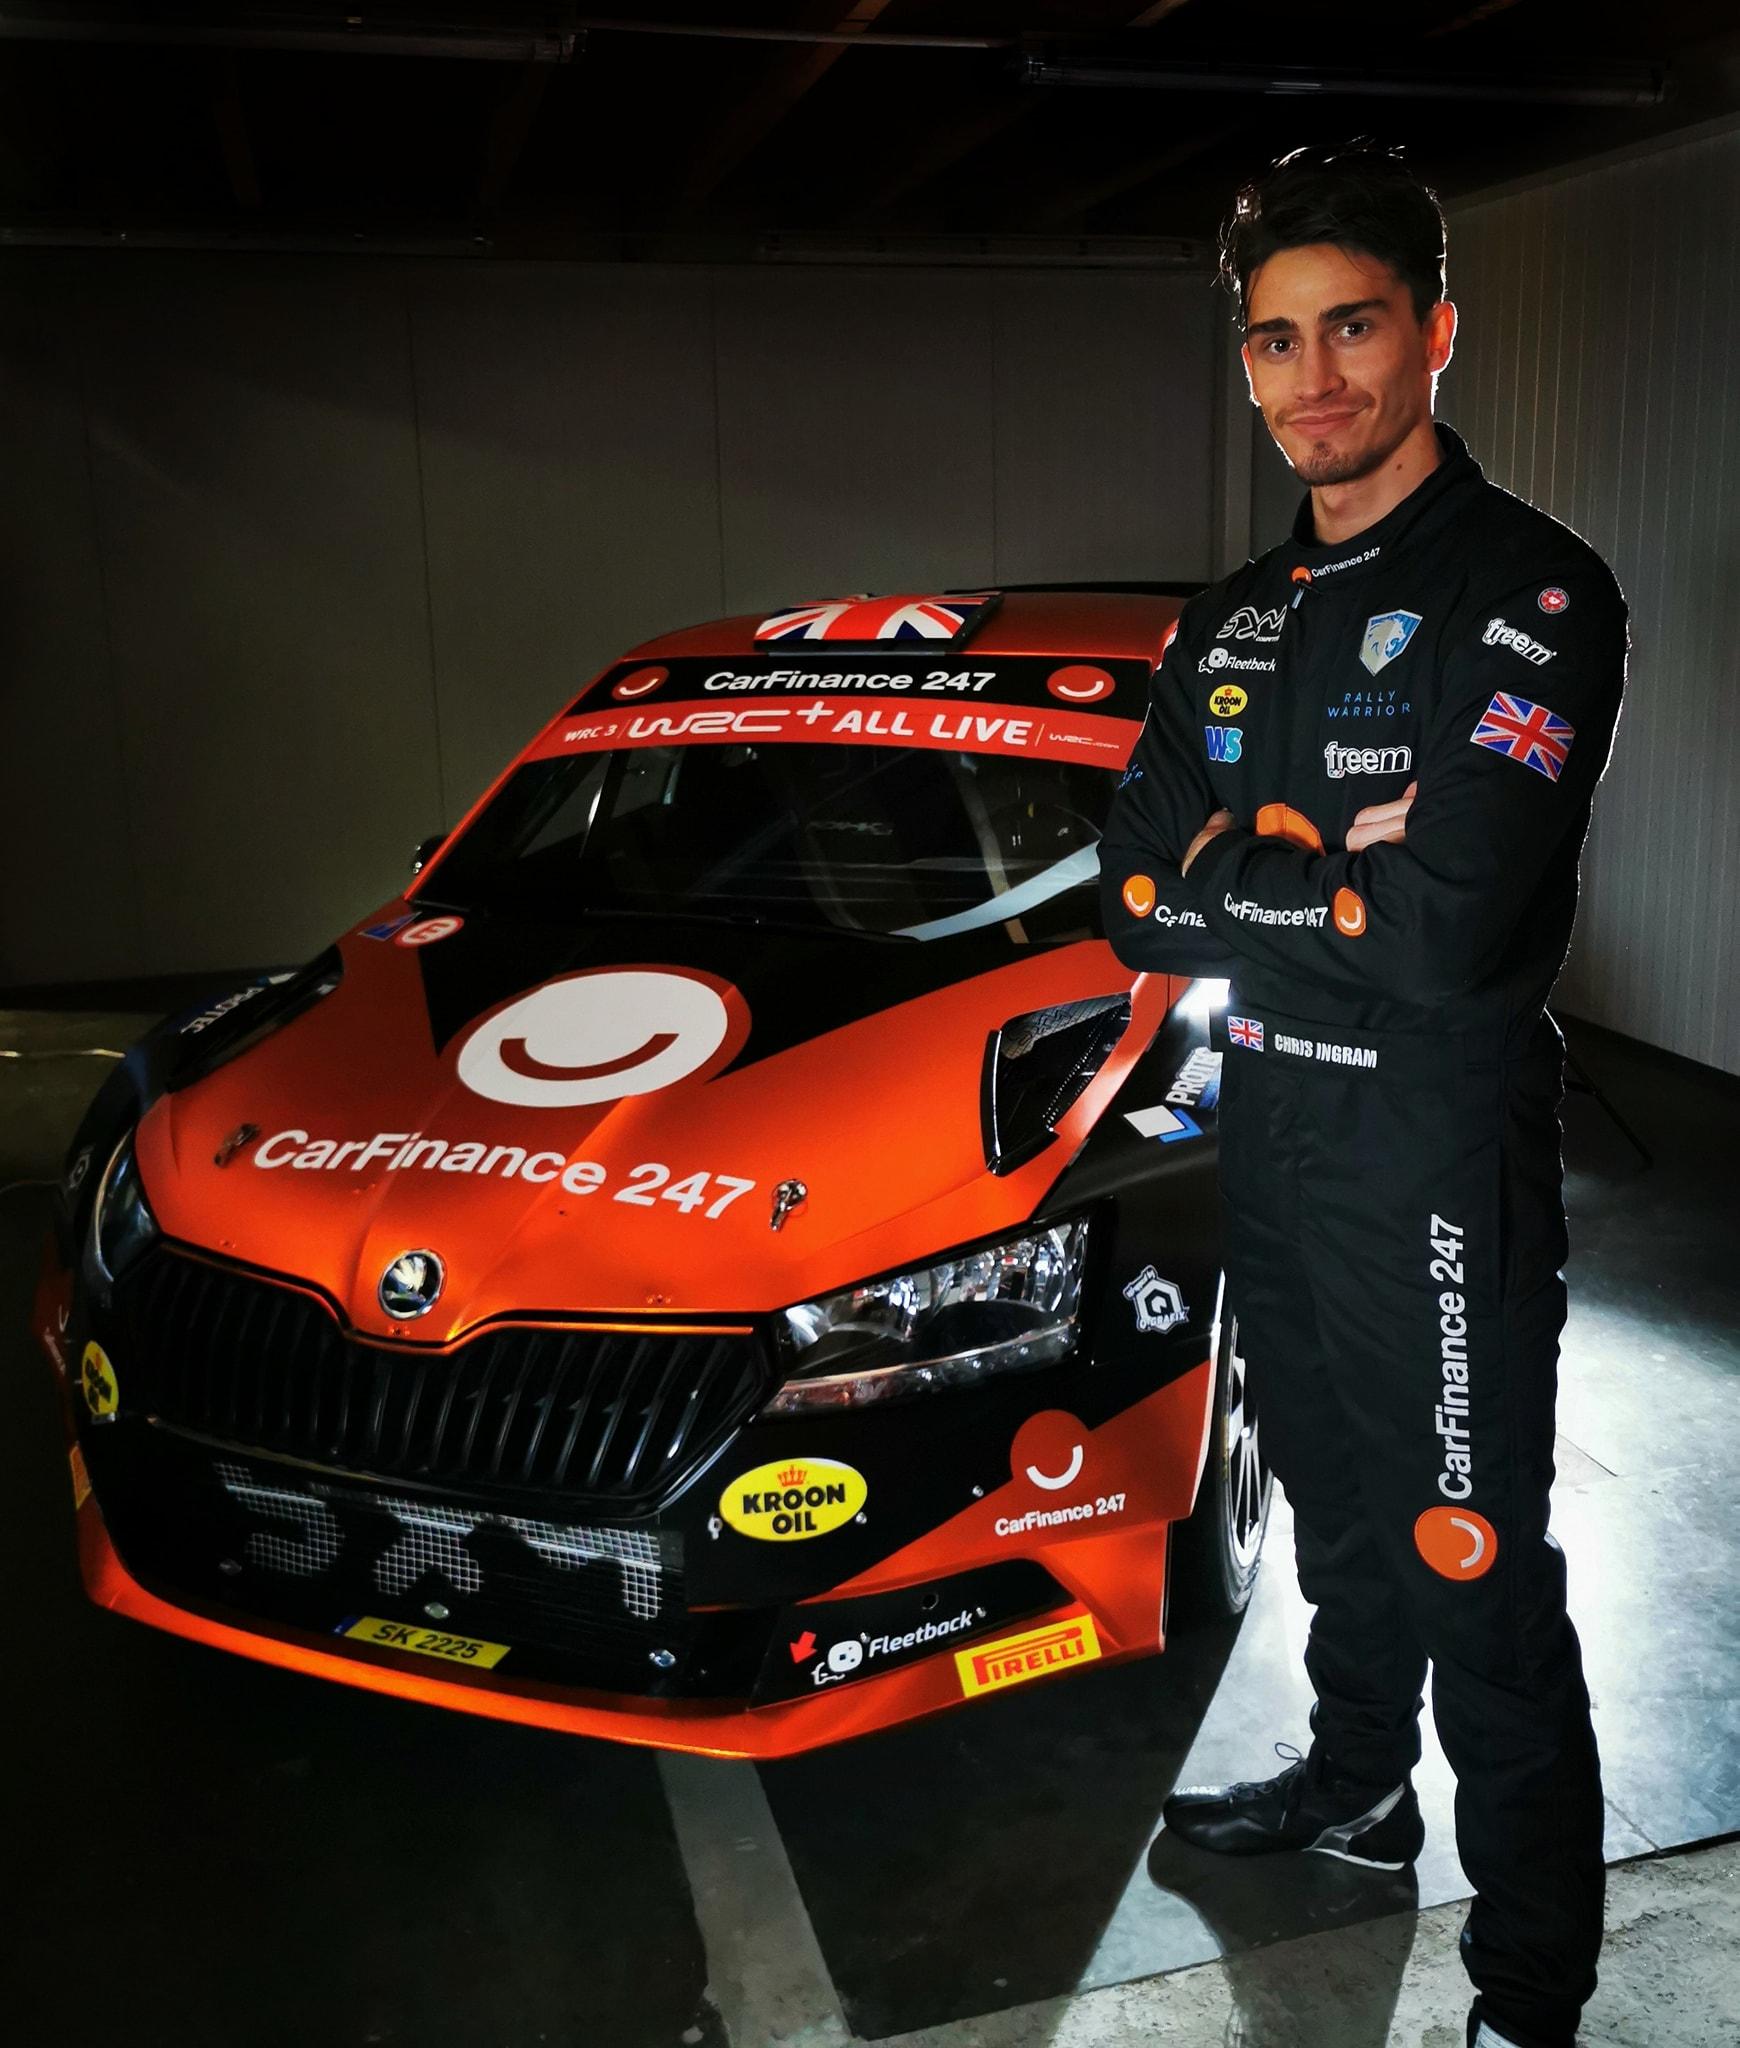 Chris Ingram is a WRC-3-ban folytatja